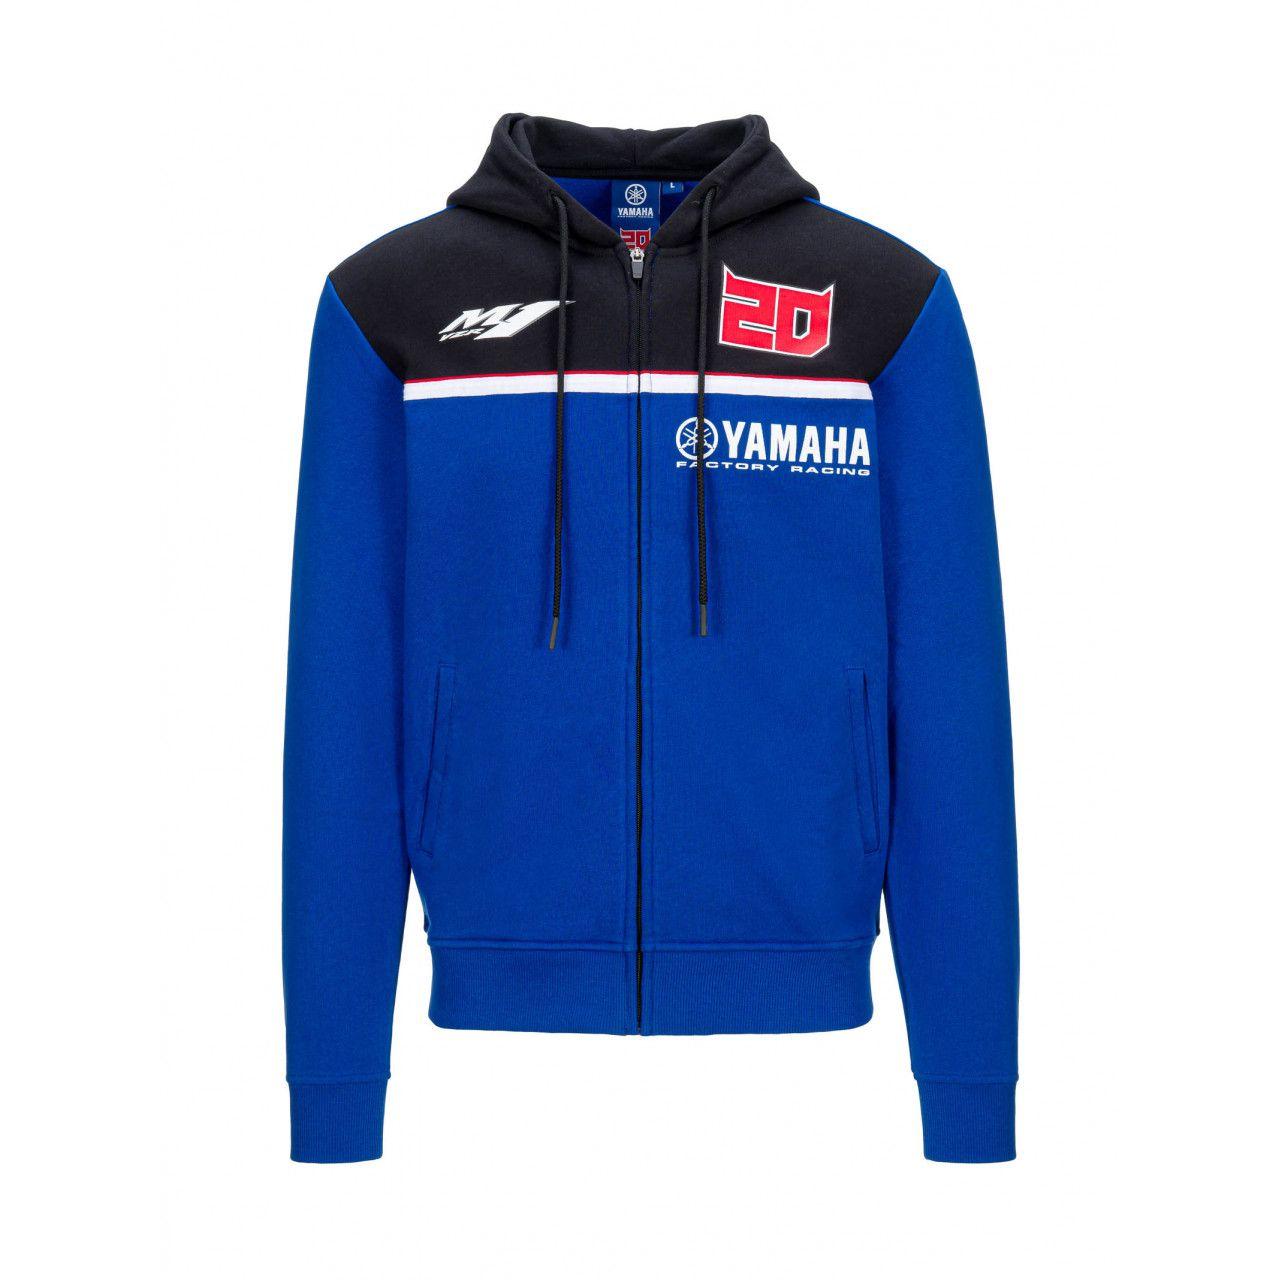 YAMAHA Sweat homme Fabio Quartararo 2021